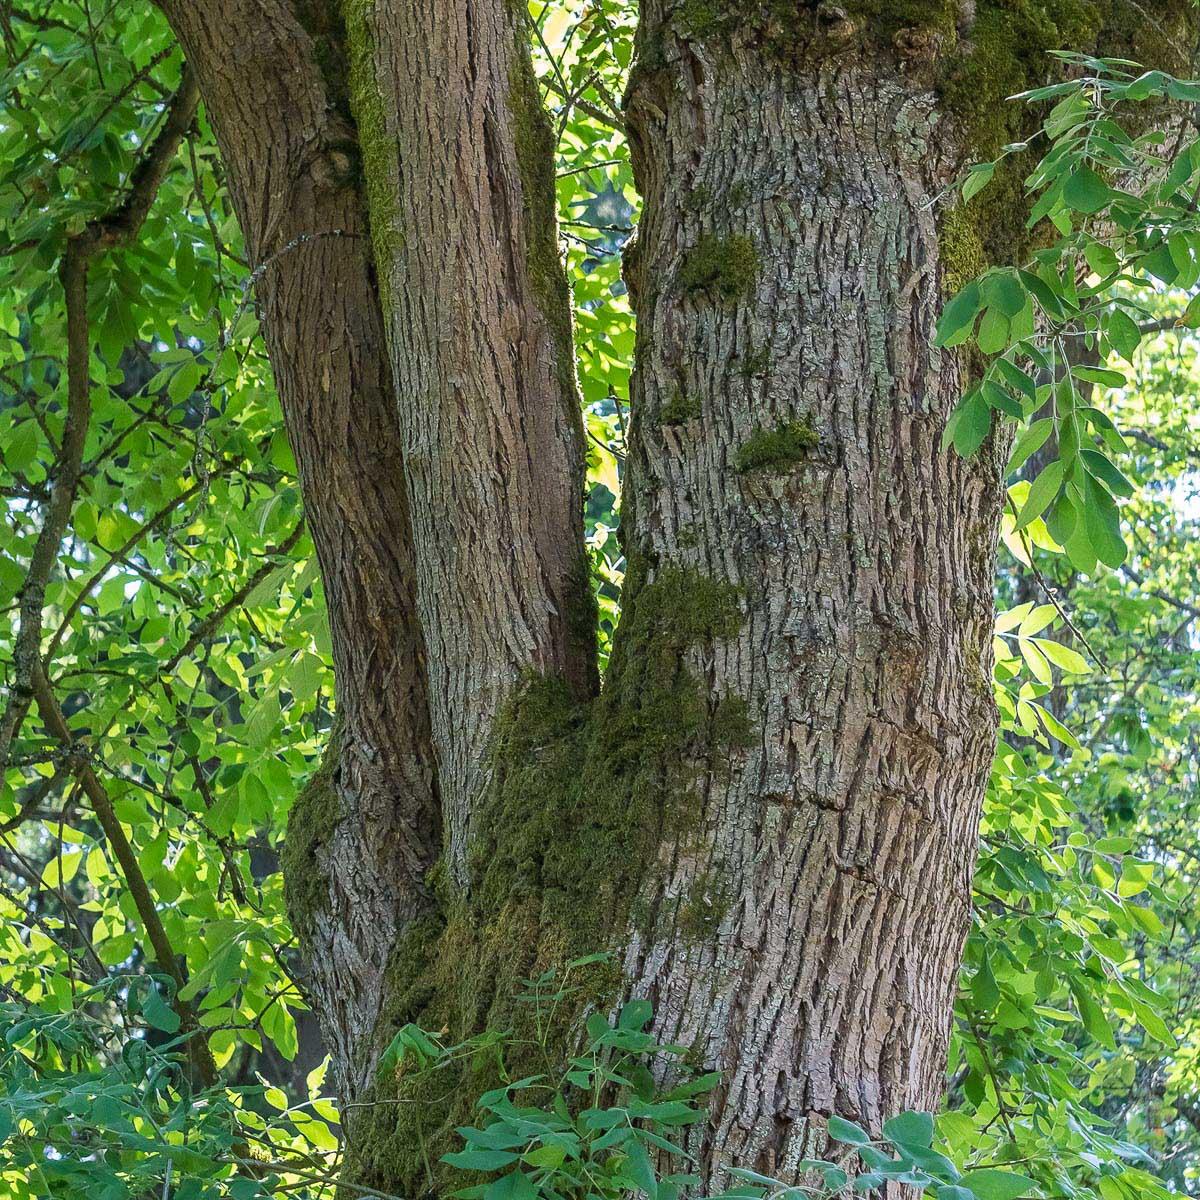 Bark of mature Oregon ash